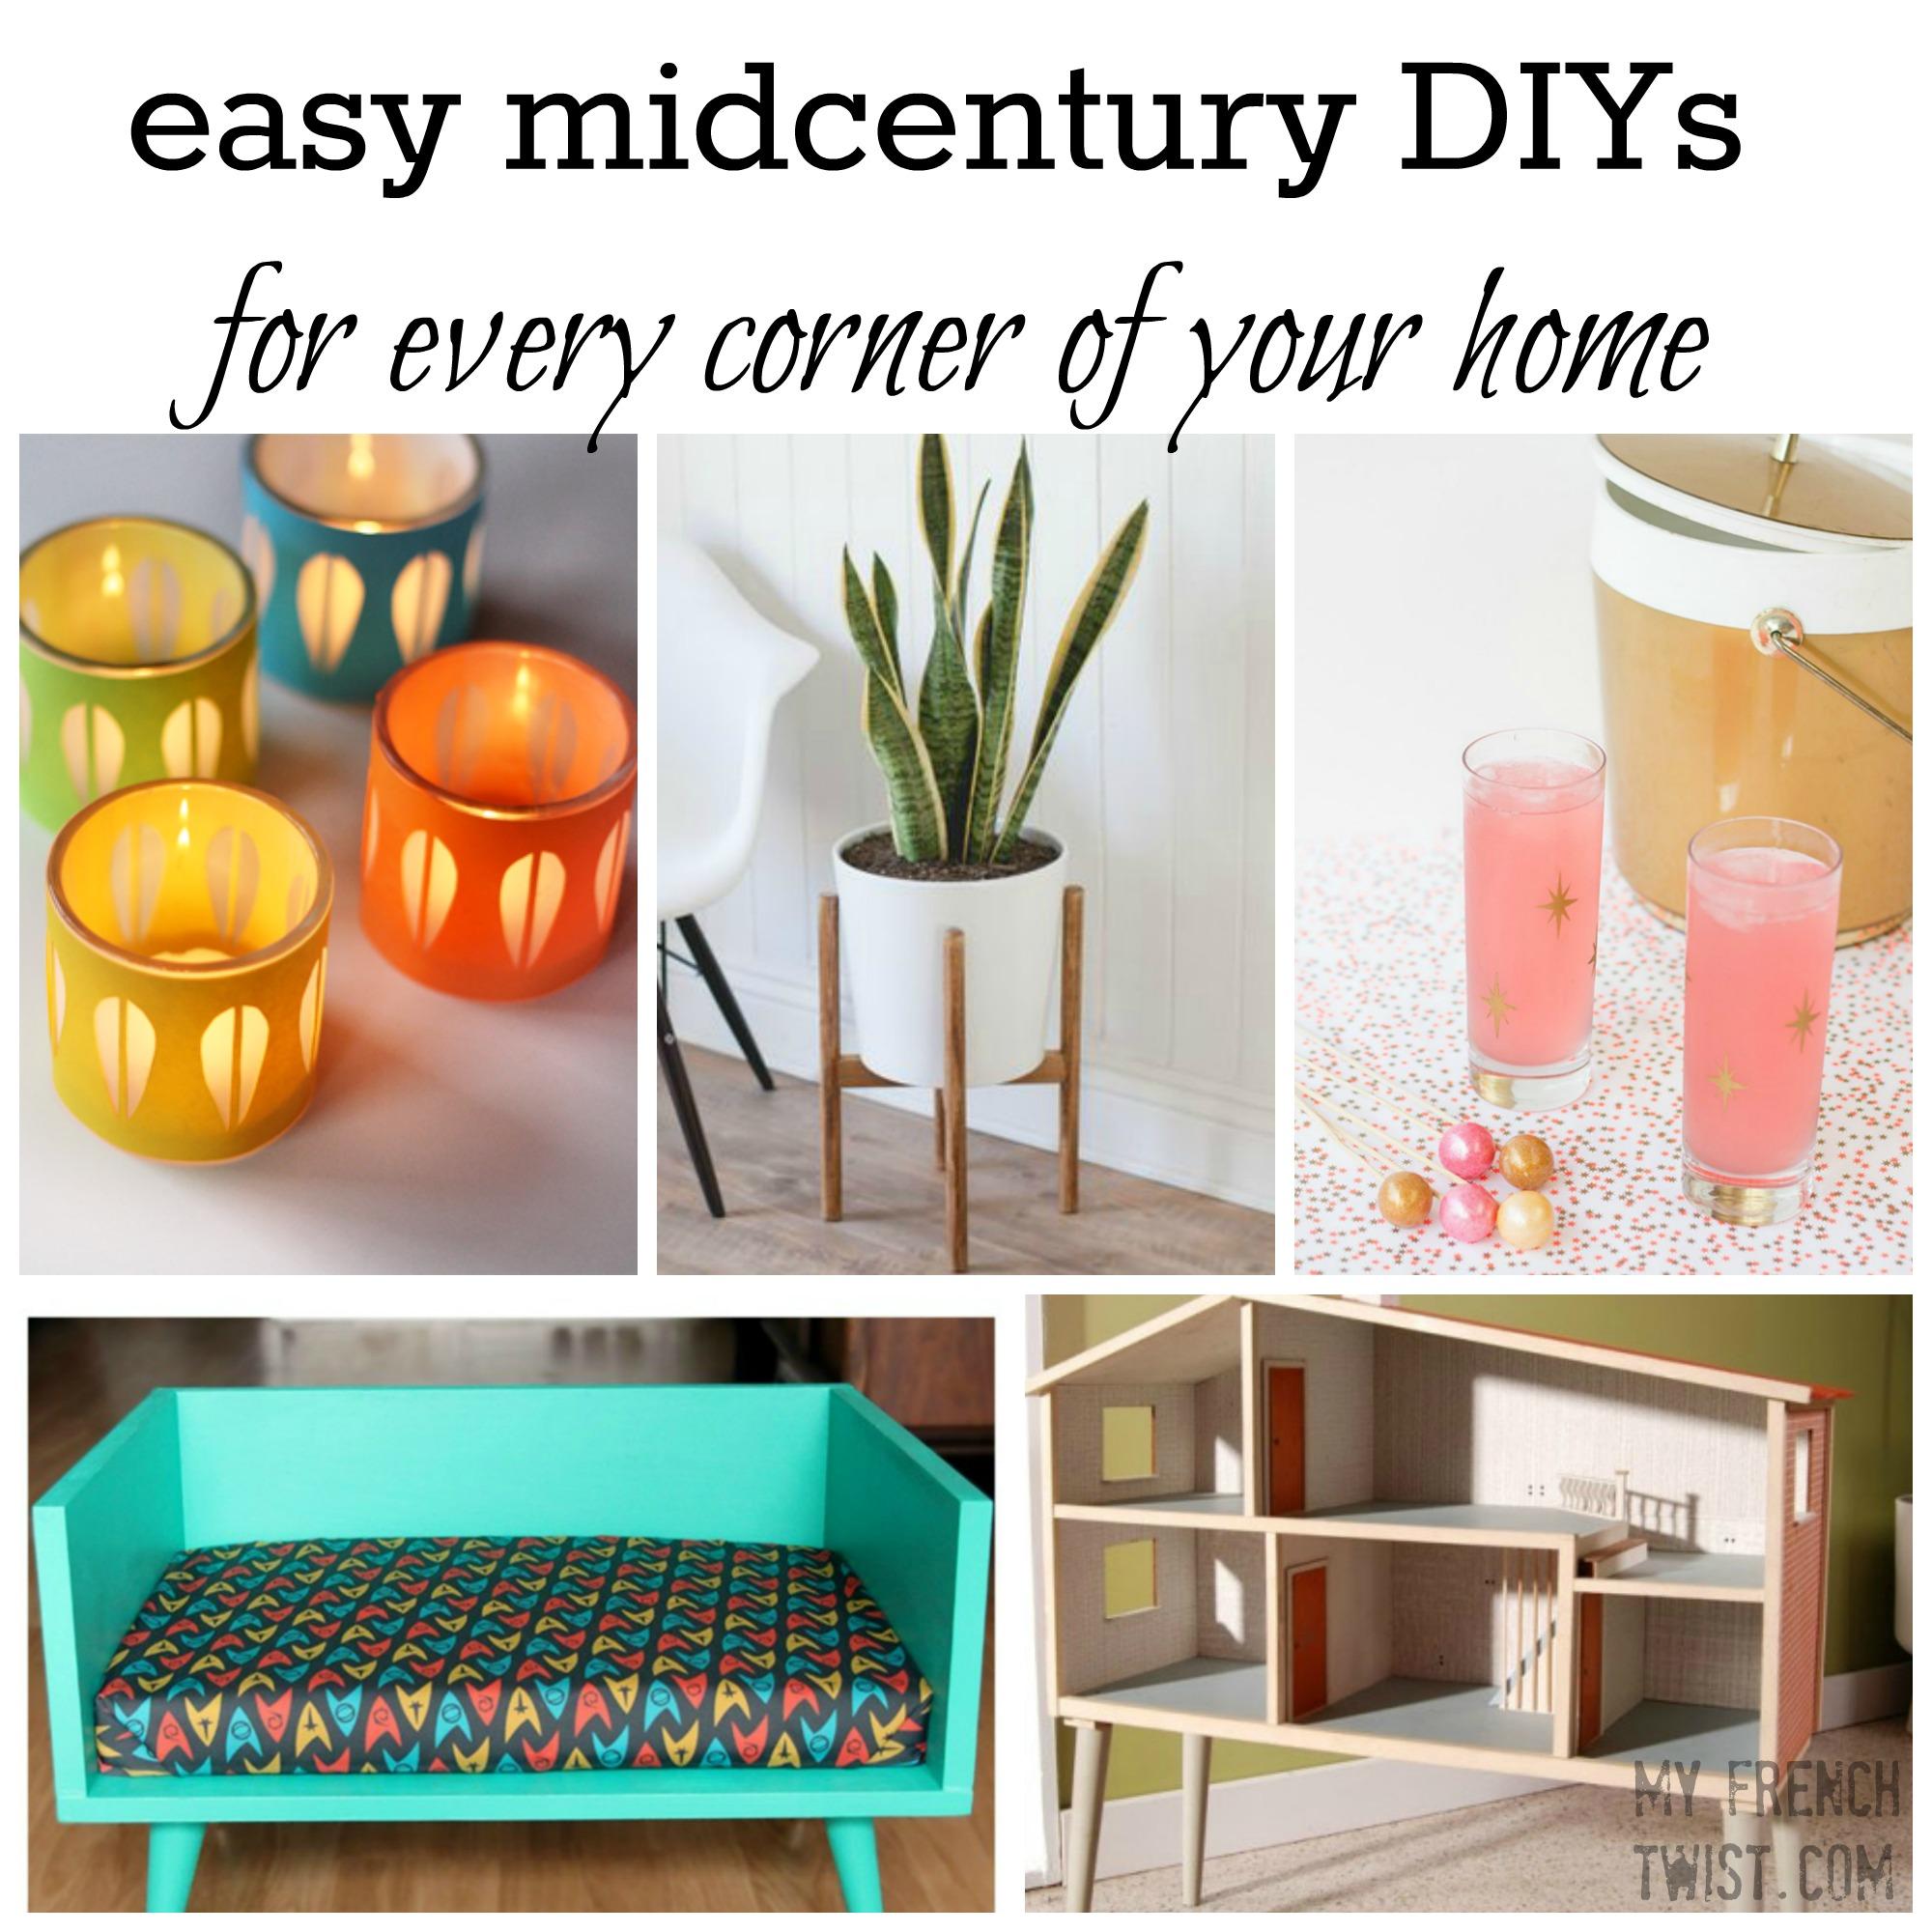 round ups easy midcentury DIYs - myfrenchtwist.com